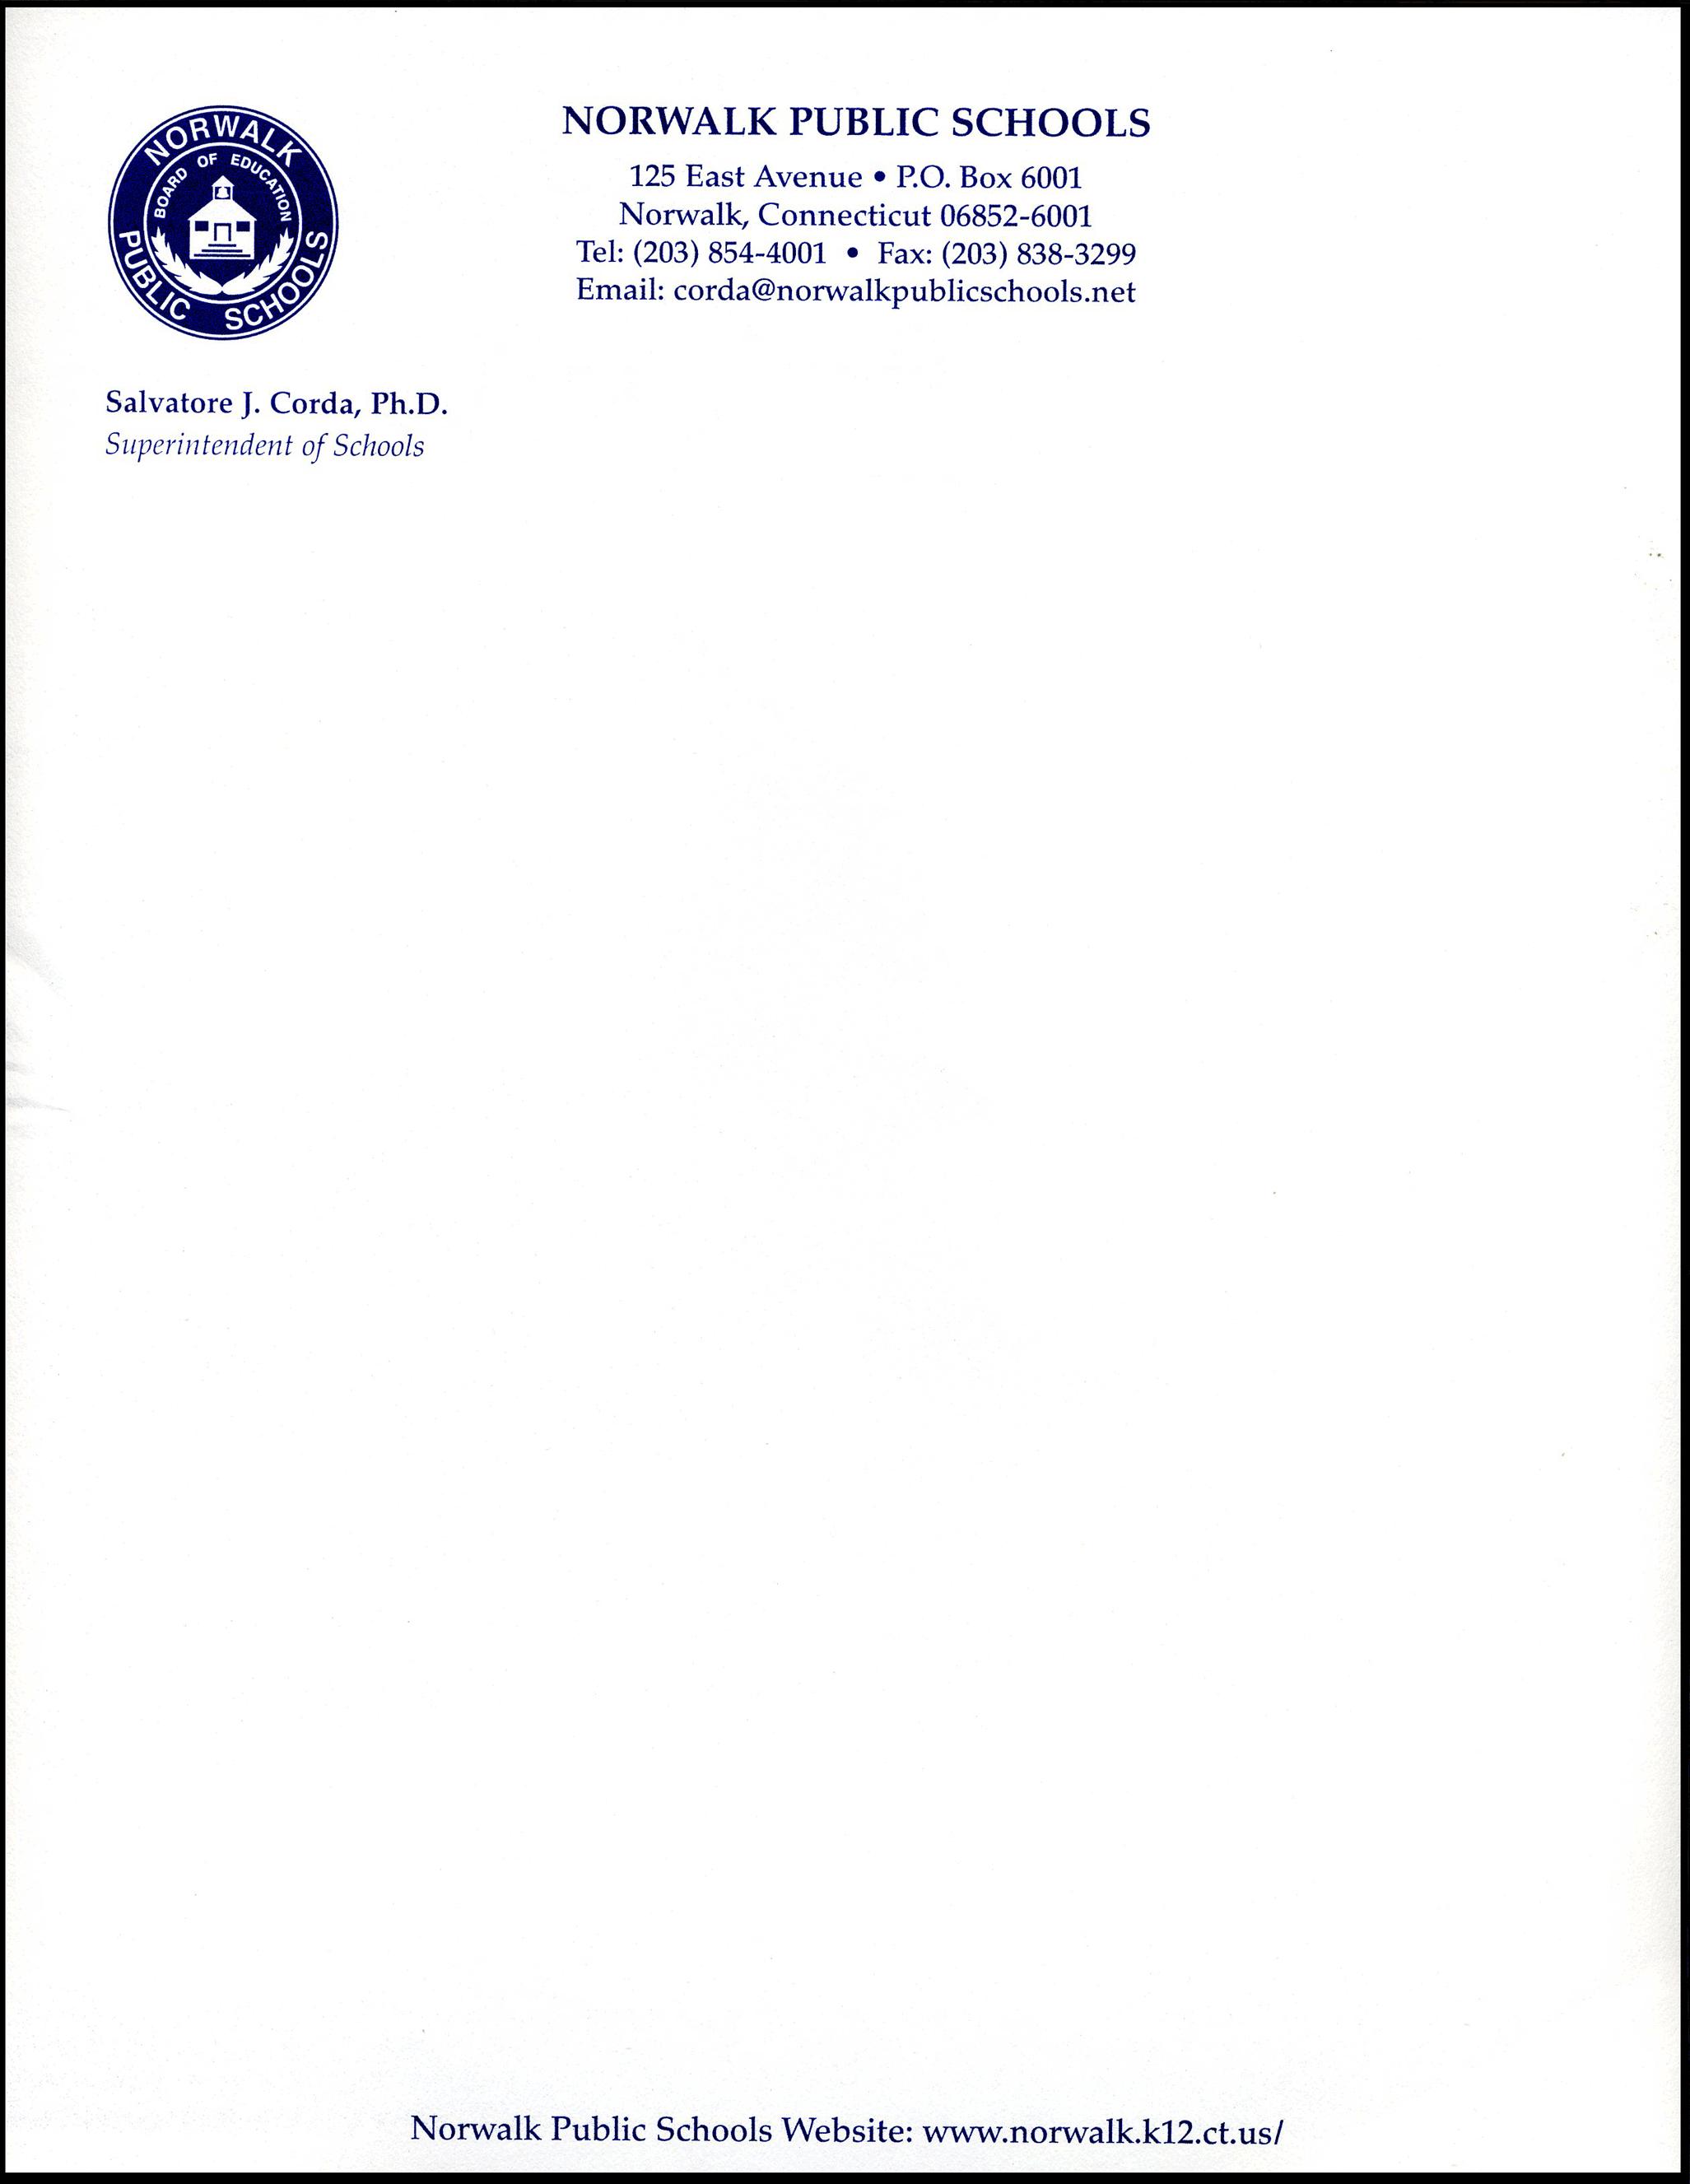 Complete Business Stationary Design  Corporate Design  Letterhead sample Company letterhead